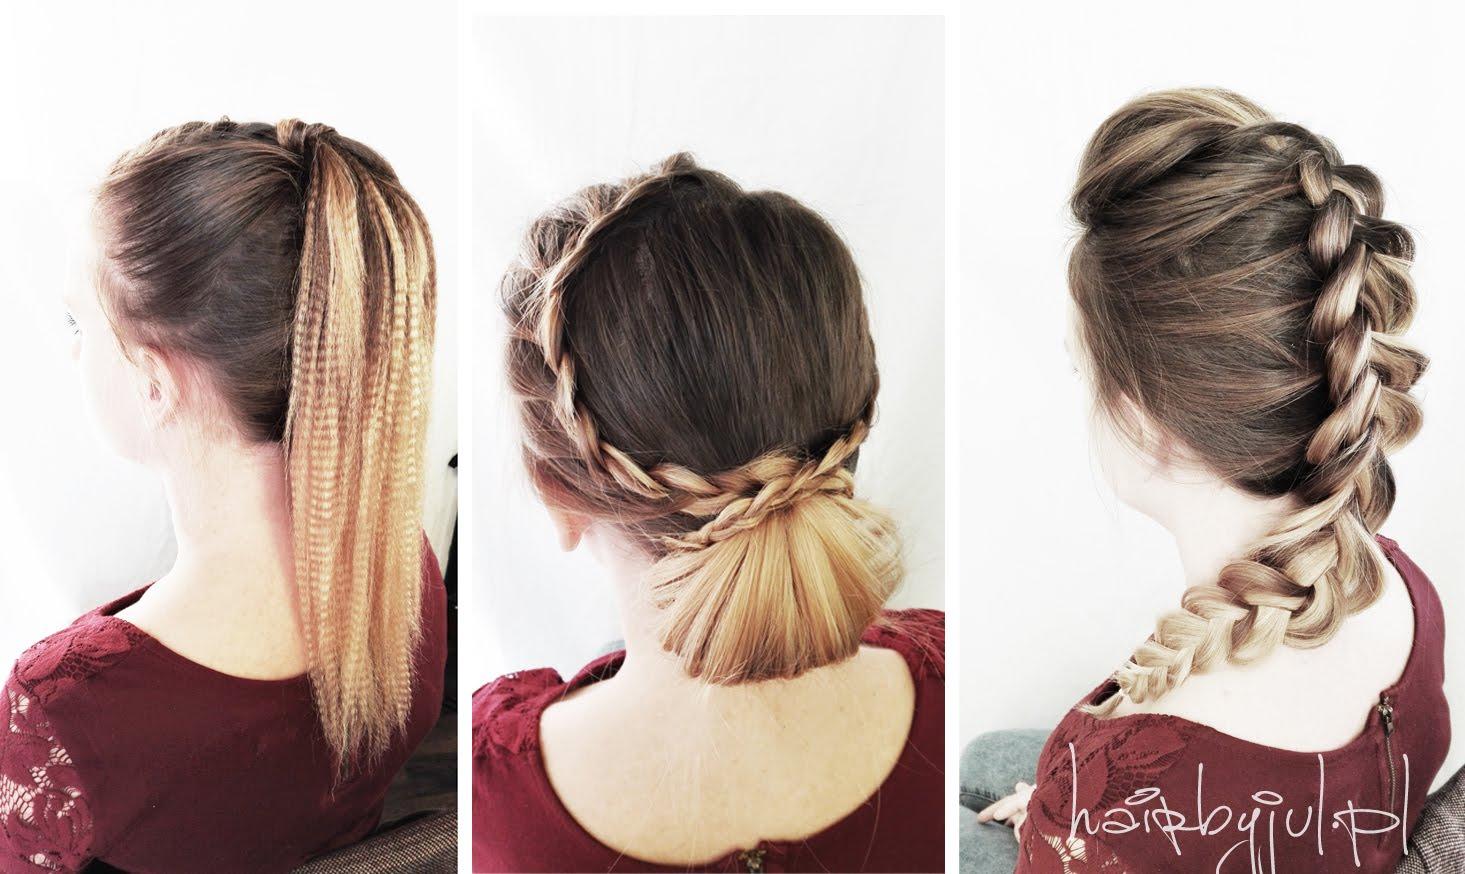 3 Fryzury Na Sylwestra Krok Po Kroku Hair By Jul Fryzury